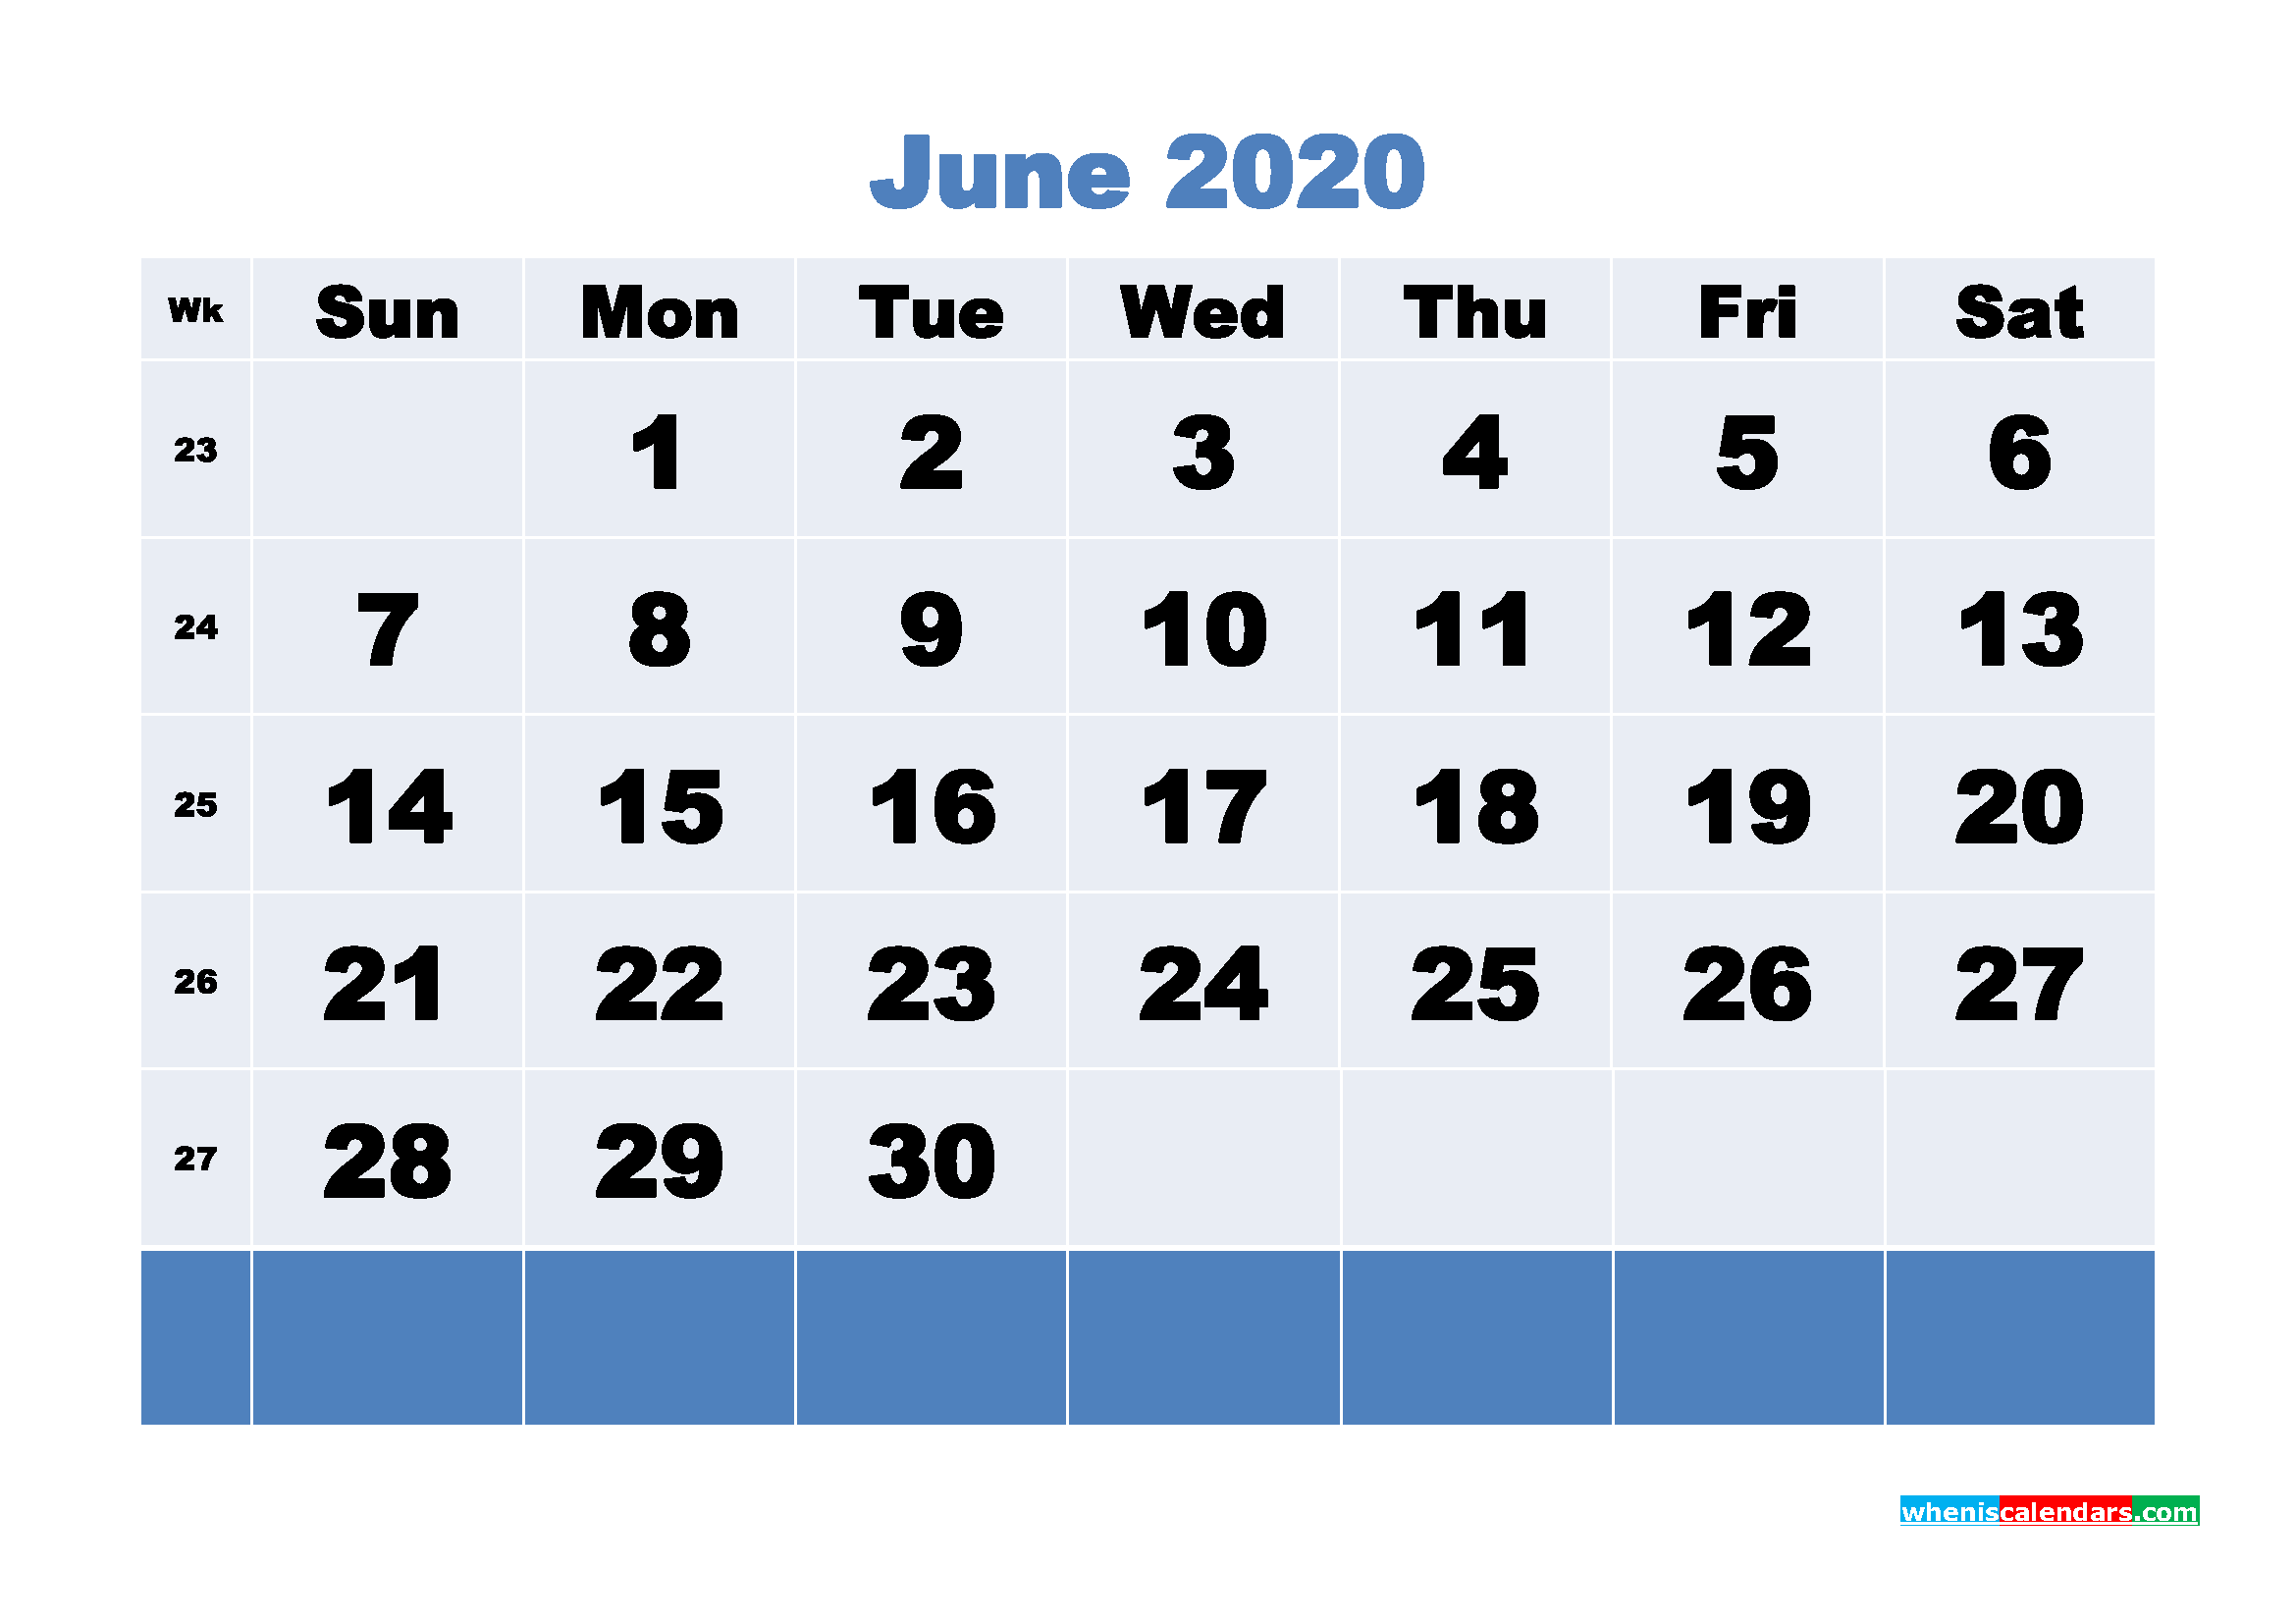 June Printable Calendar 2020 PDF, Word - No.m20b90